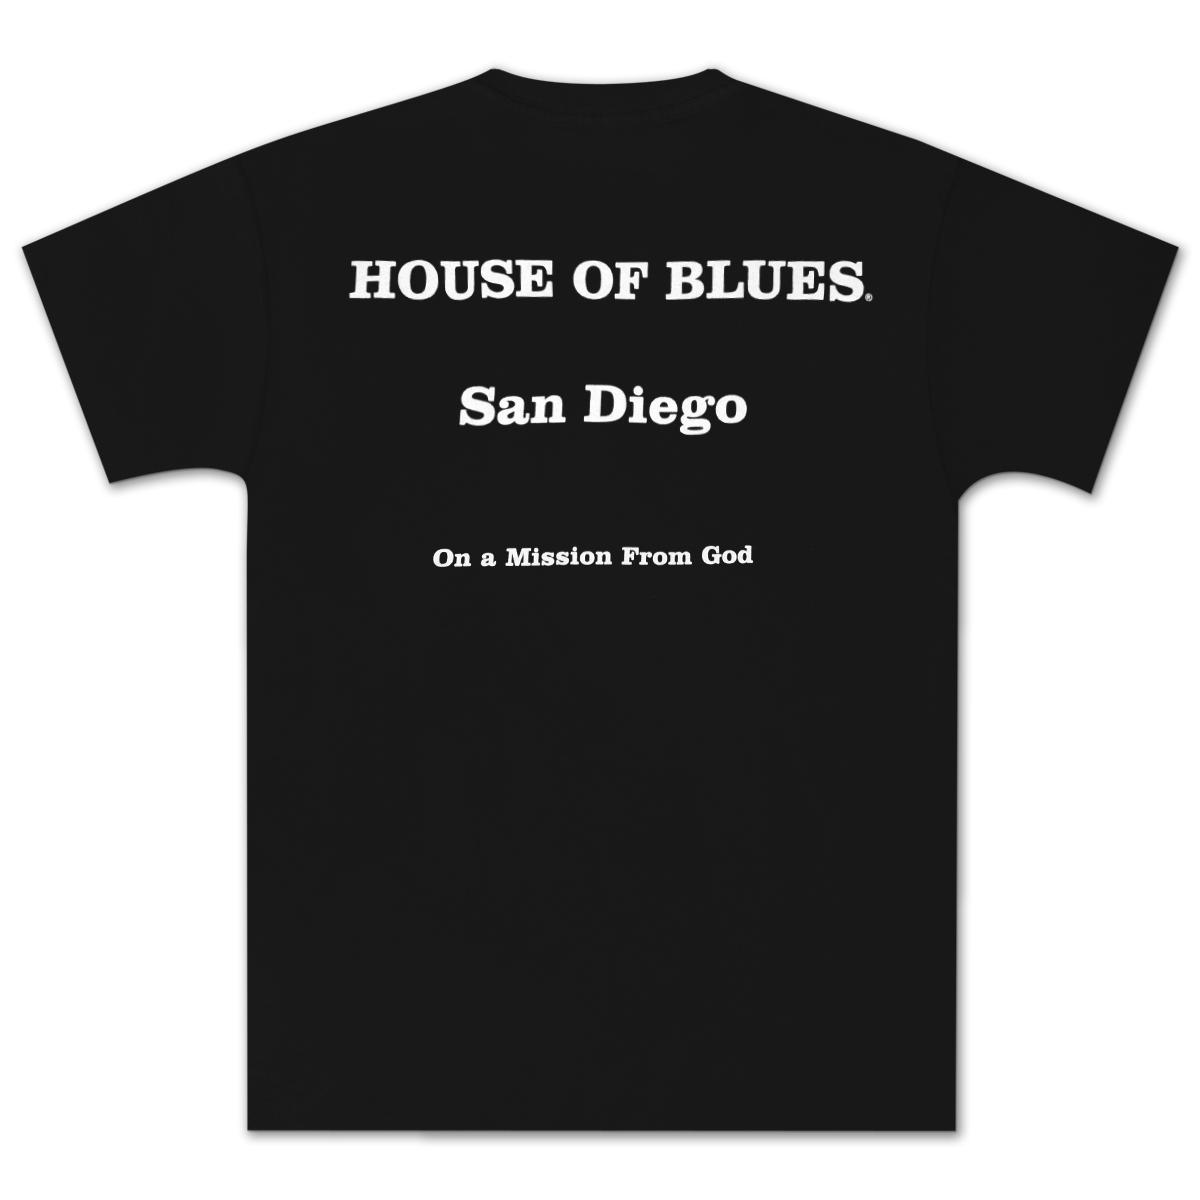 House of Blues Black J&E T-Shirt - San Diego